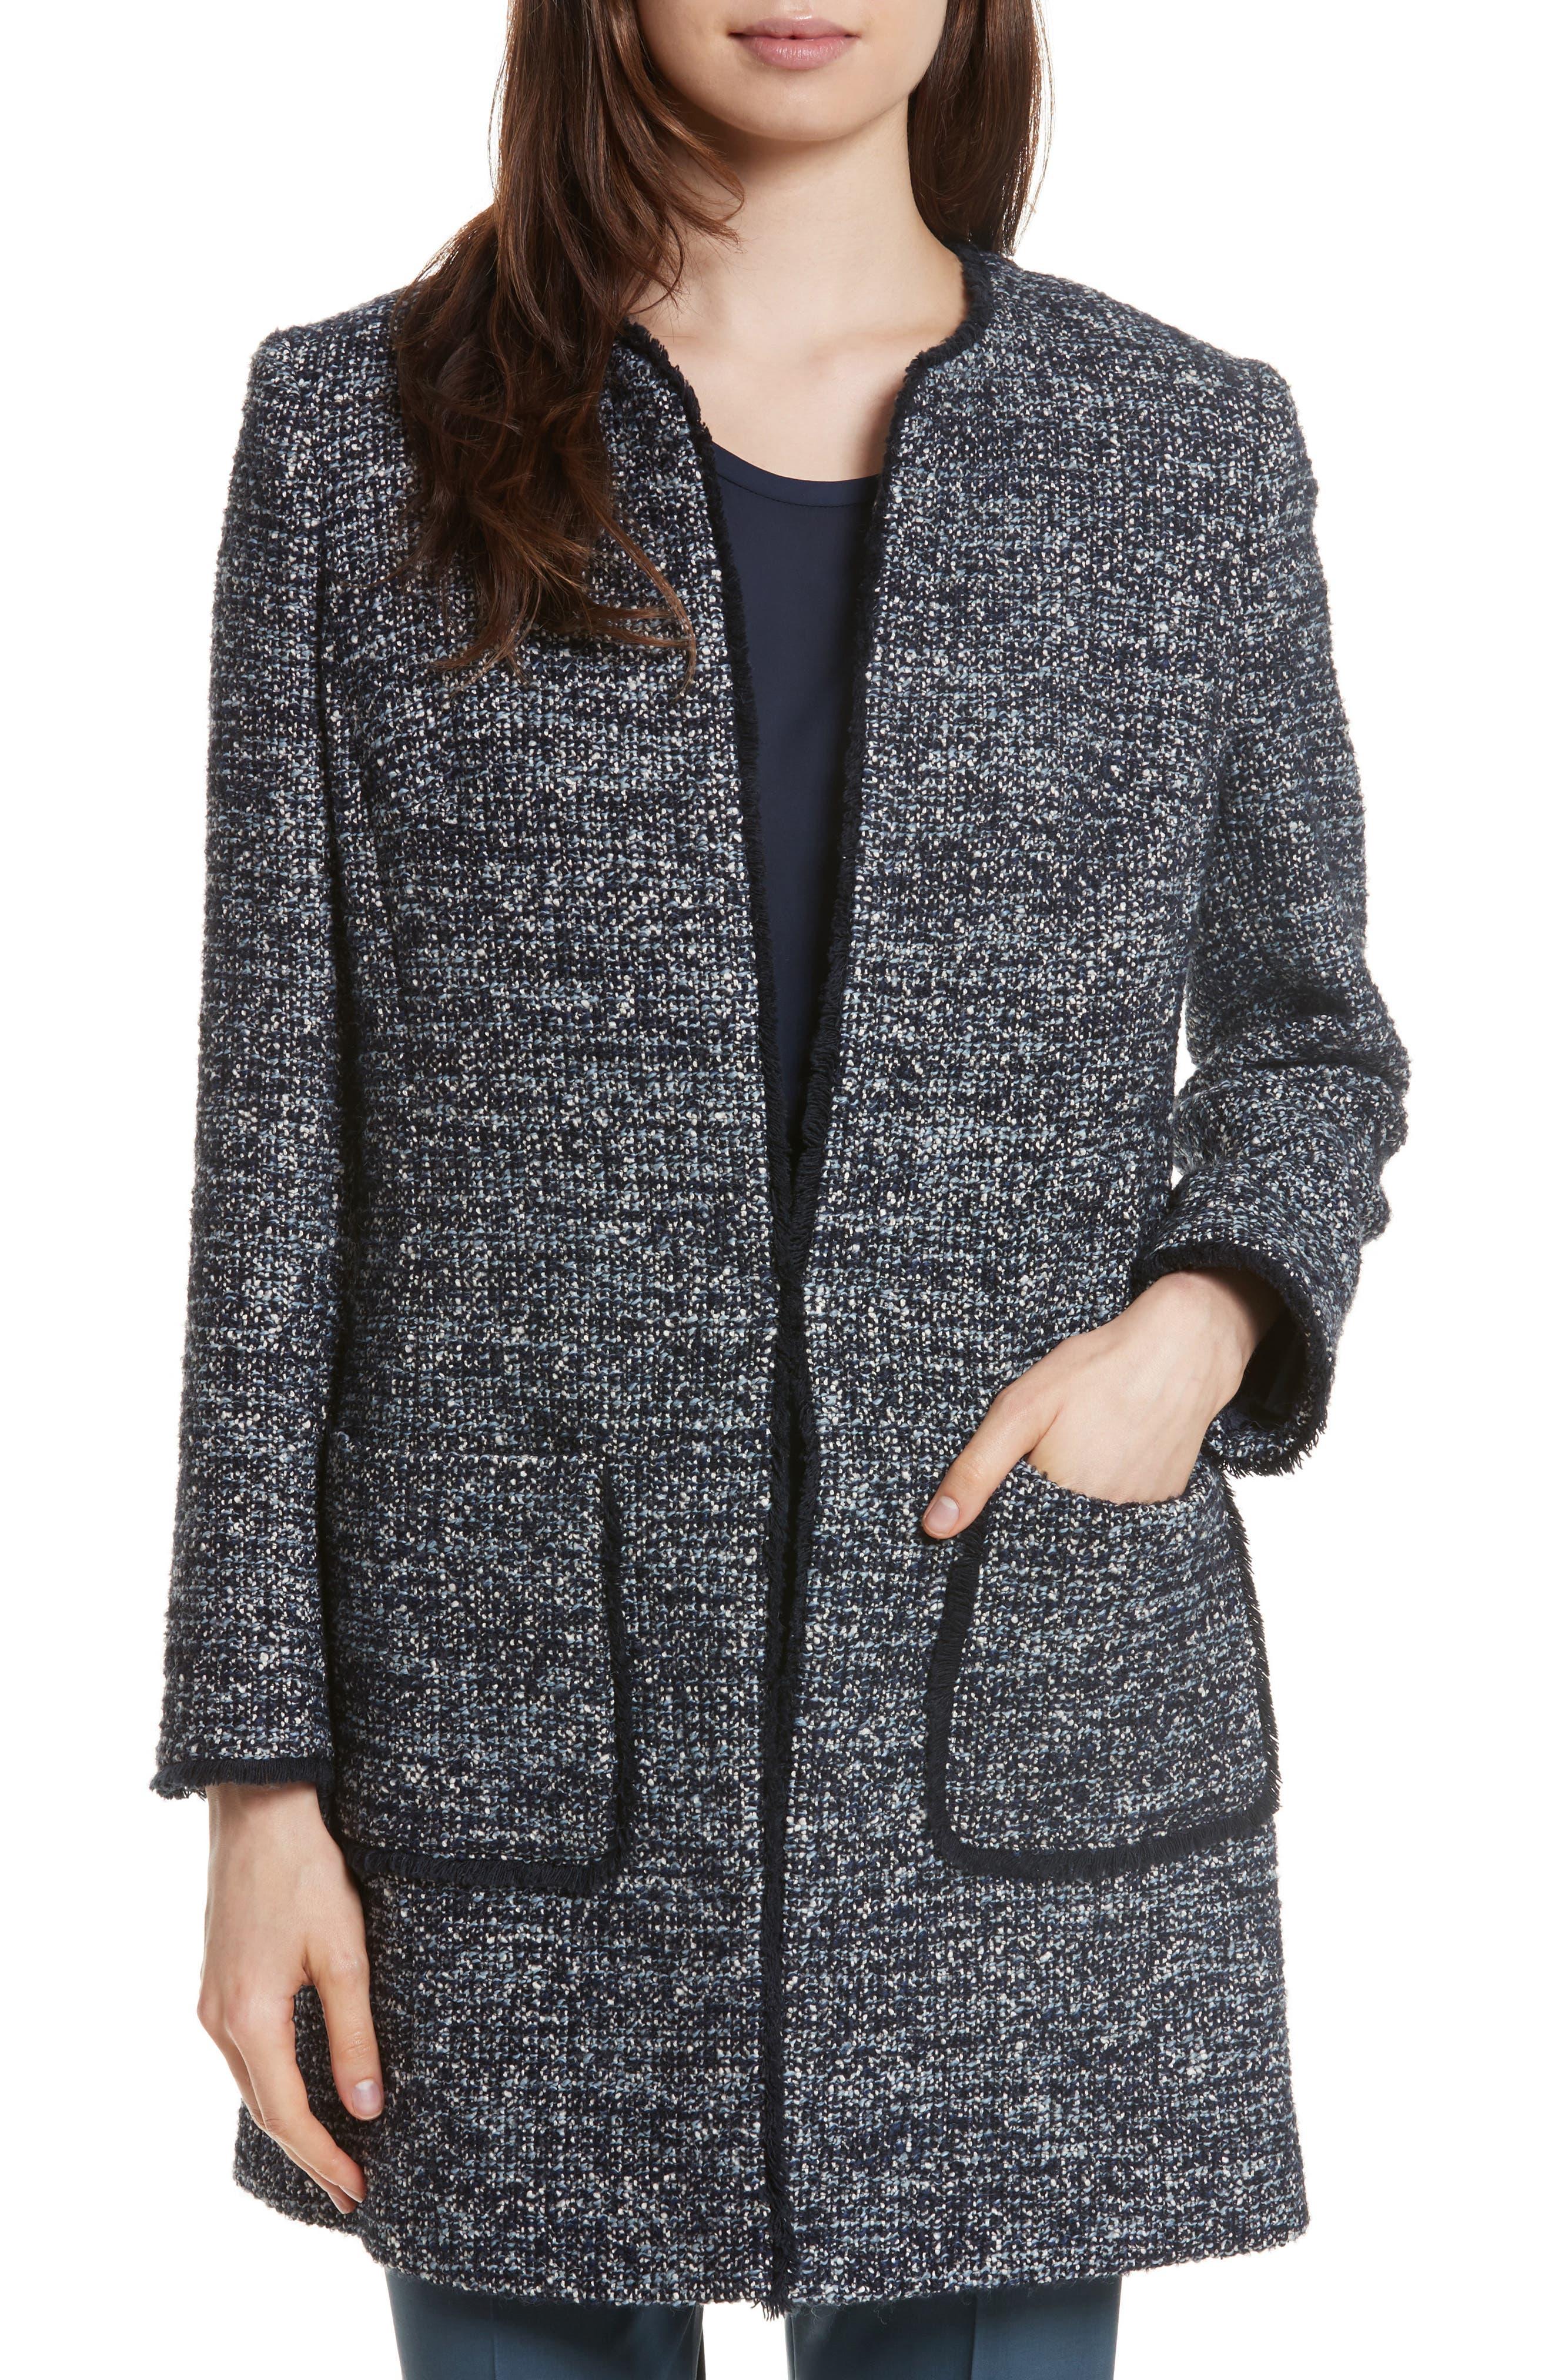 Main Image - Helene Berman Alice Tweed Jacket